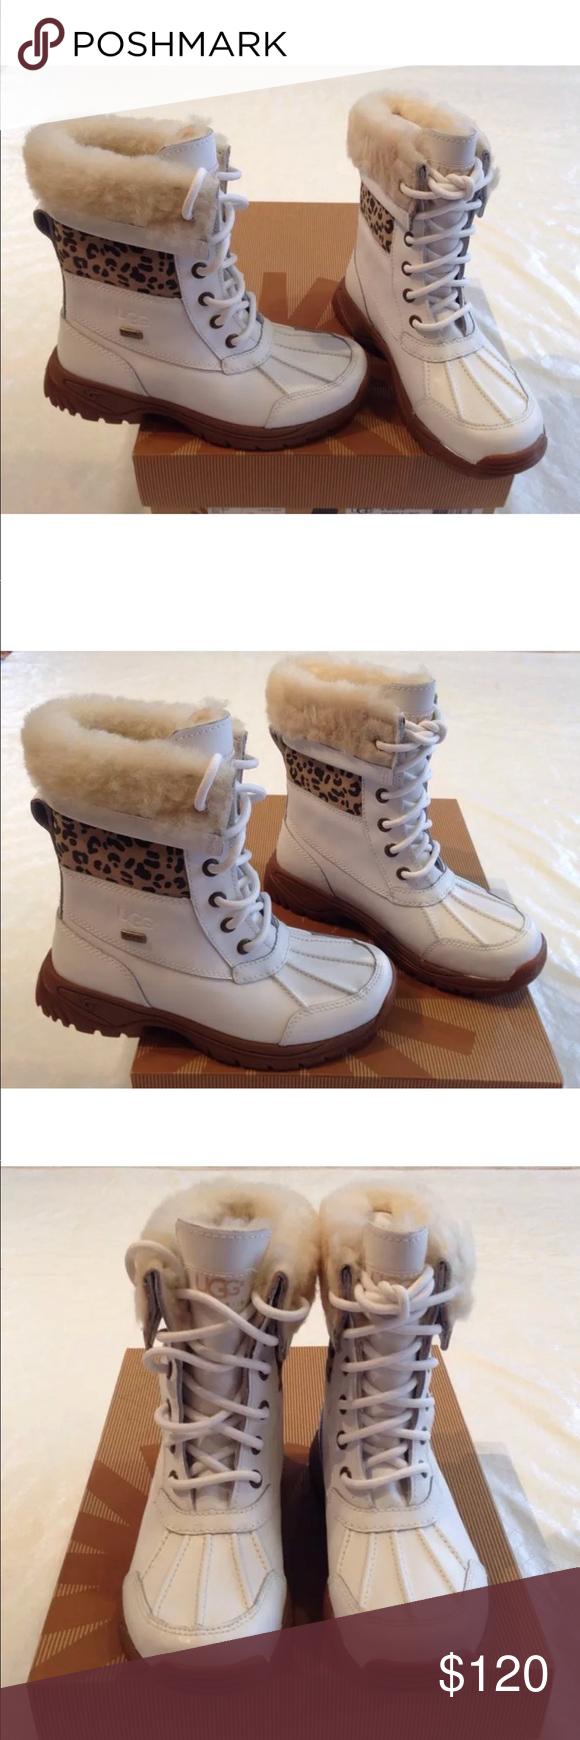 9e33a91d3d4f8 UGG Australia**White Fur-lined Boots**US 1**$170 UGG Australia- K ...